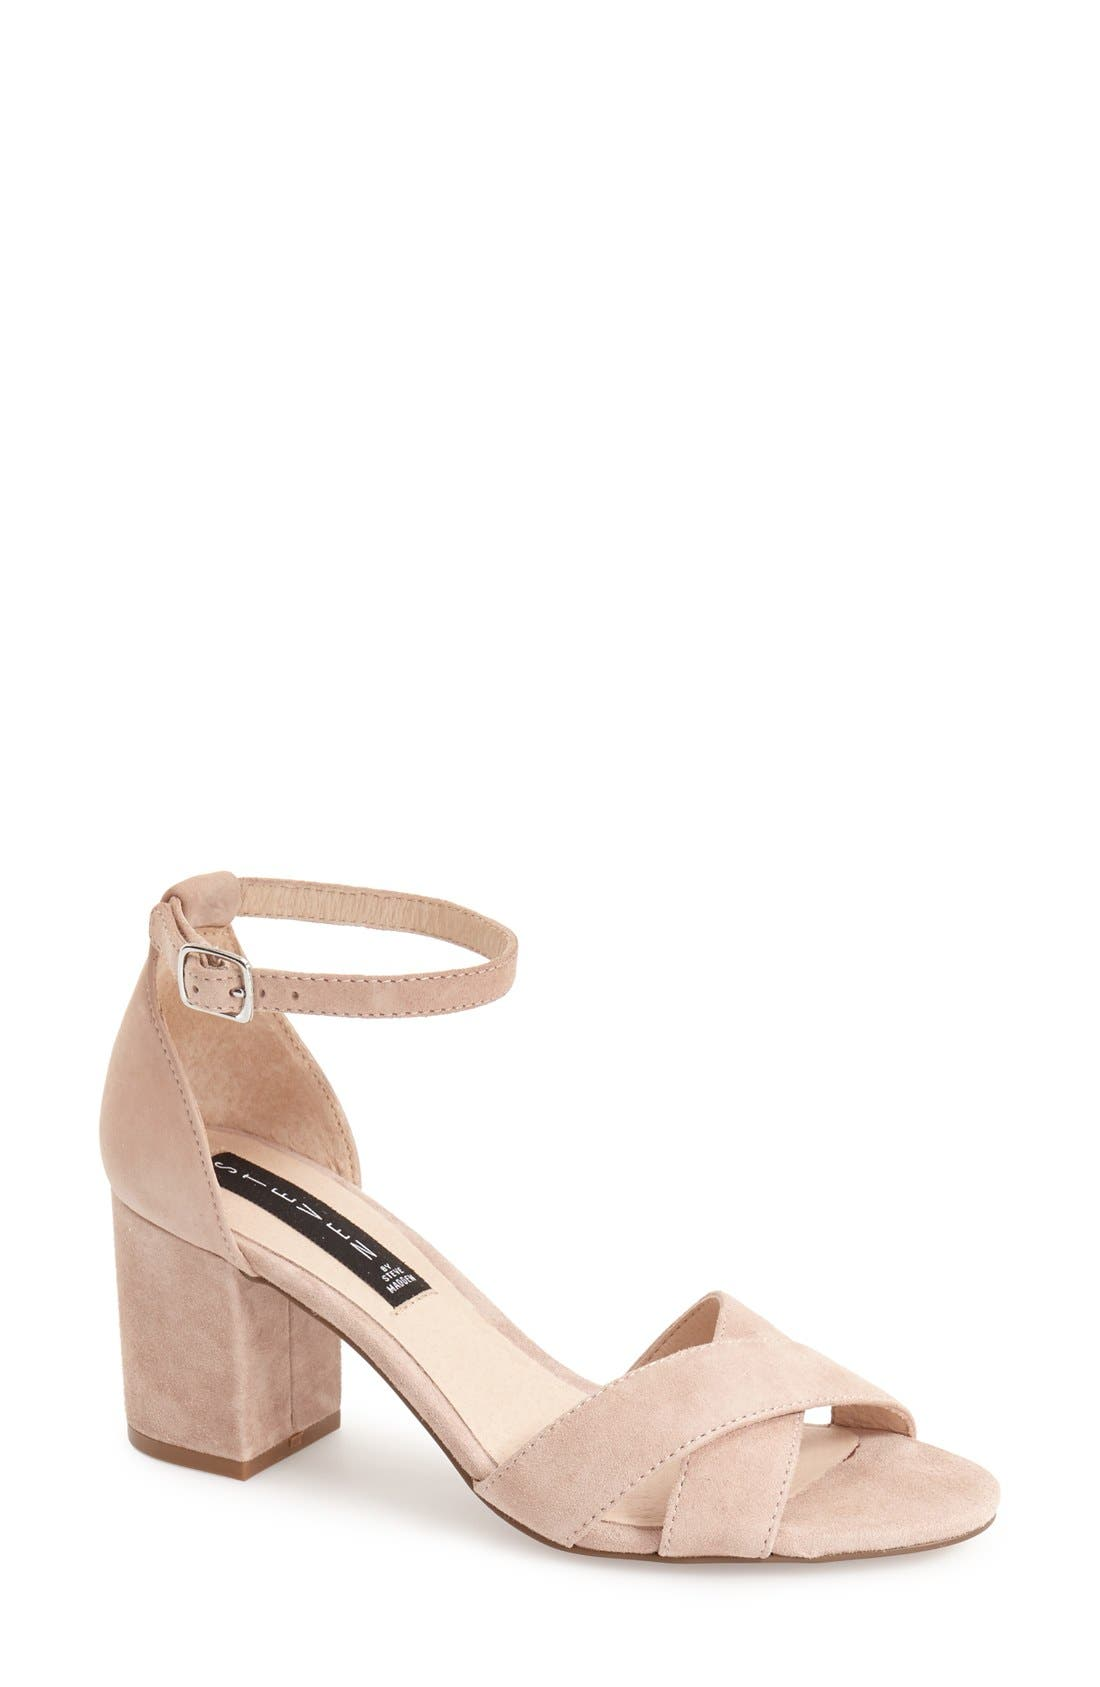 'Voomme' Ankle Strap Sandal,                             Main thumbnail 4, color,